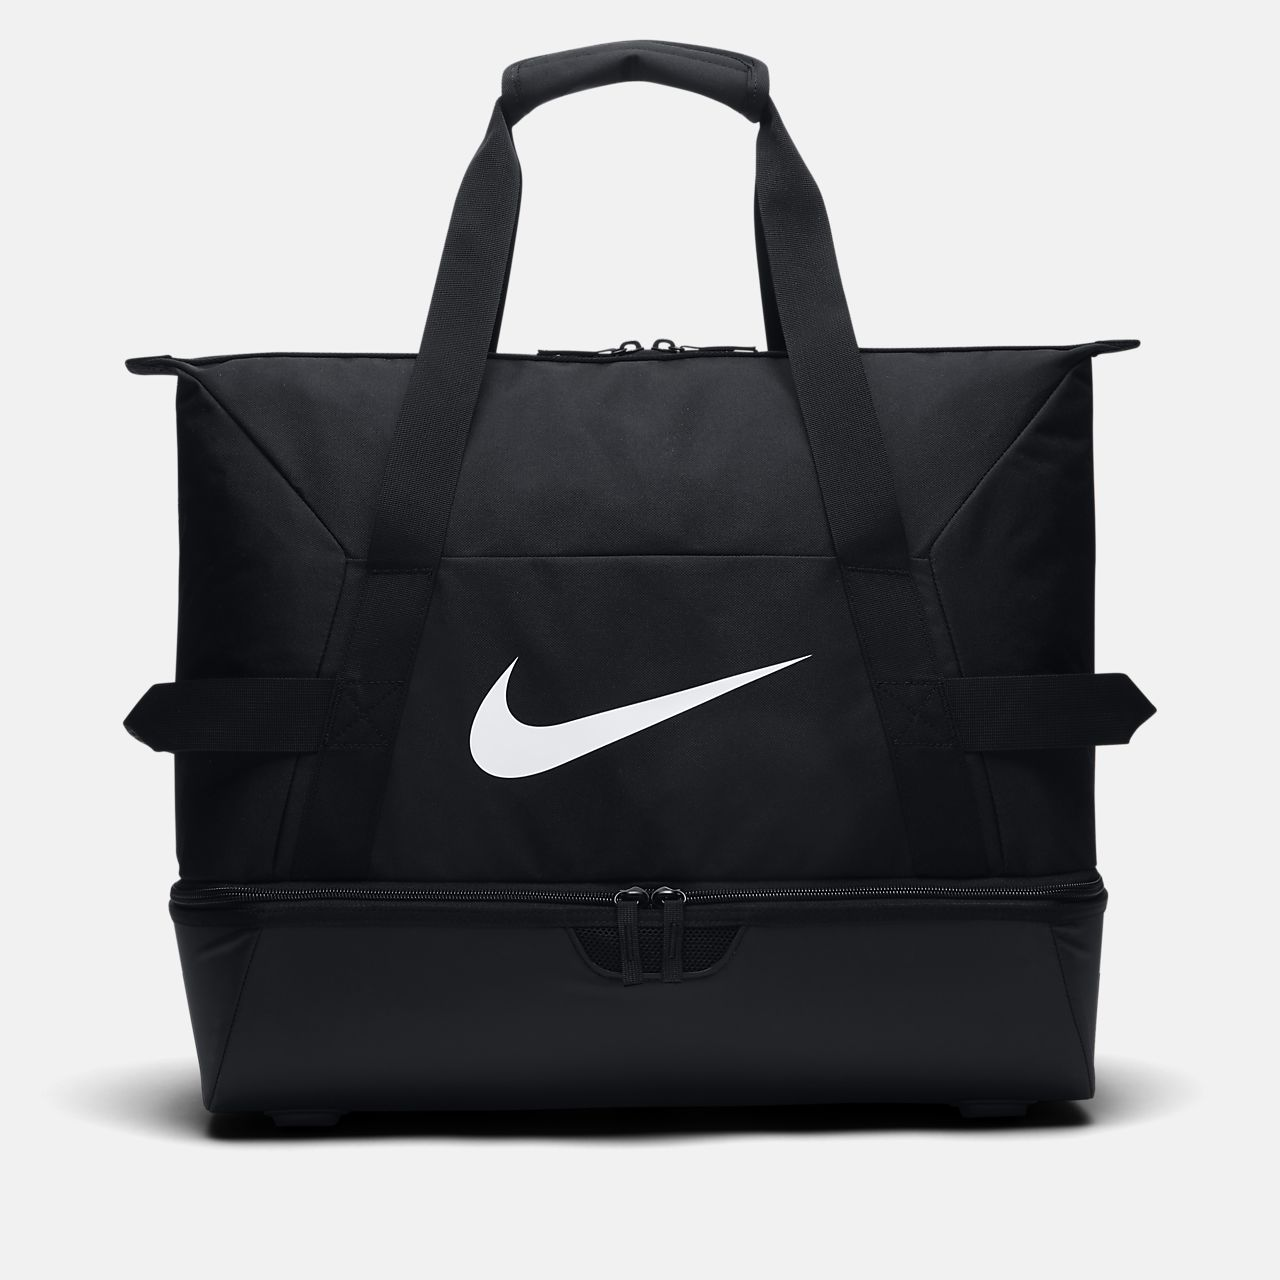 Torba piłkarska (średnia) Nike Academy Team Hardcase